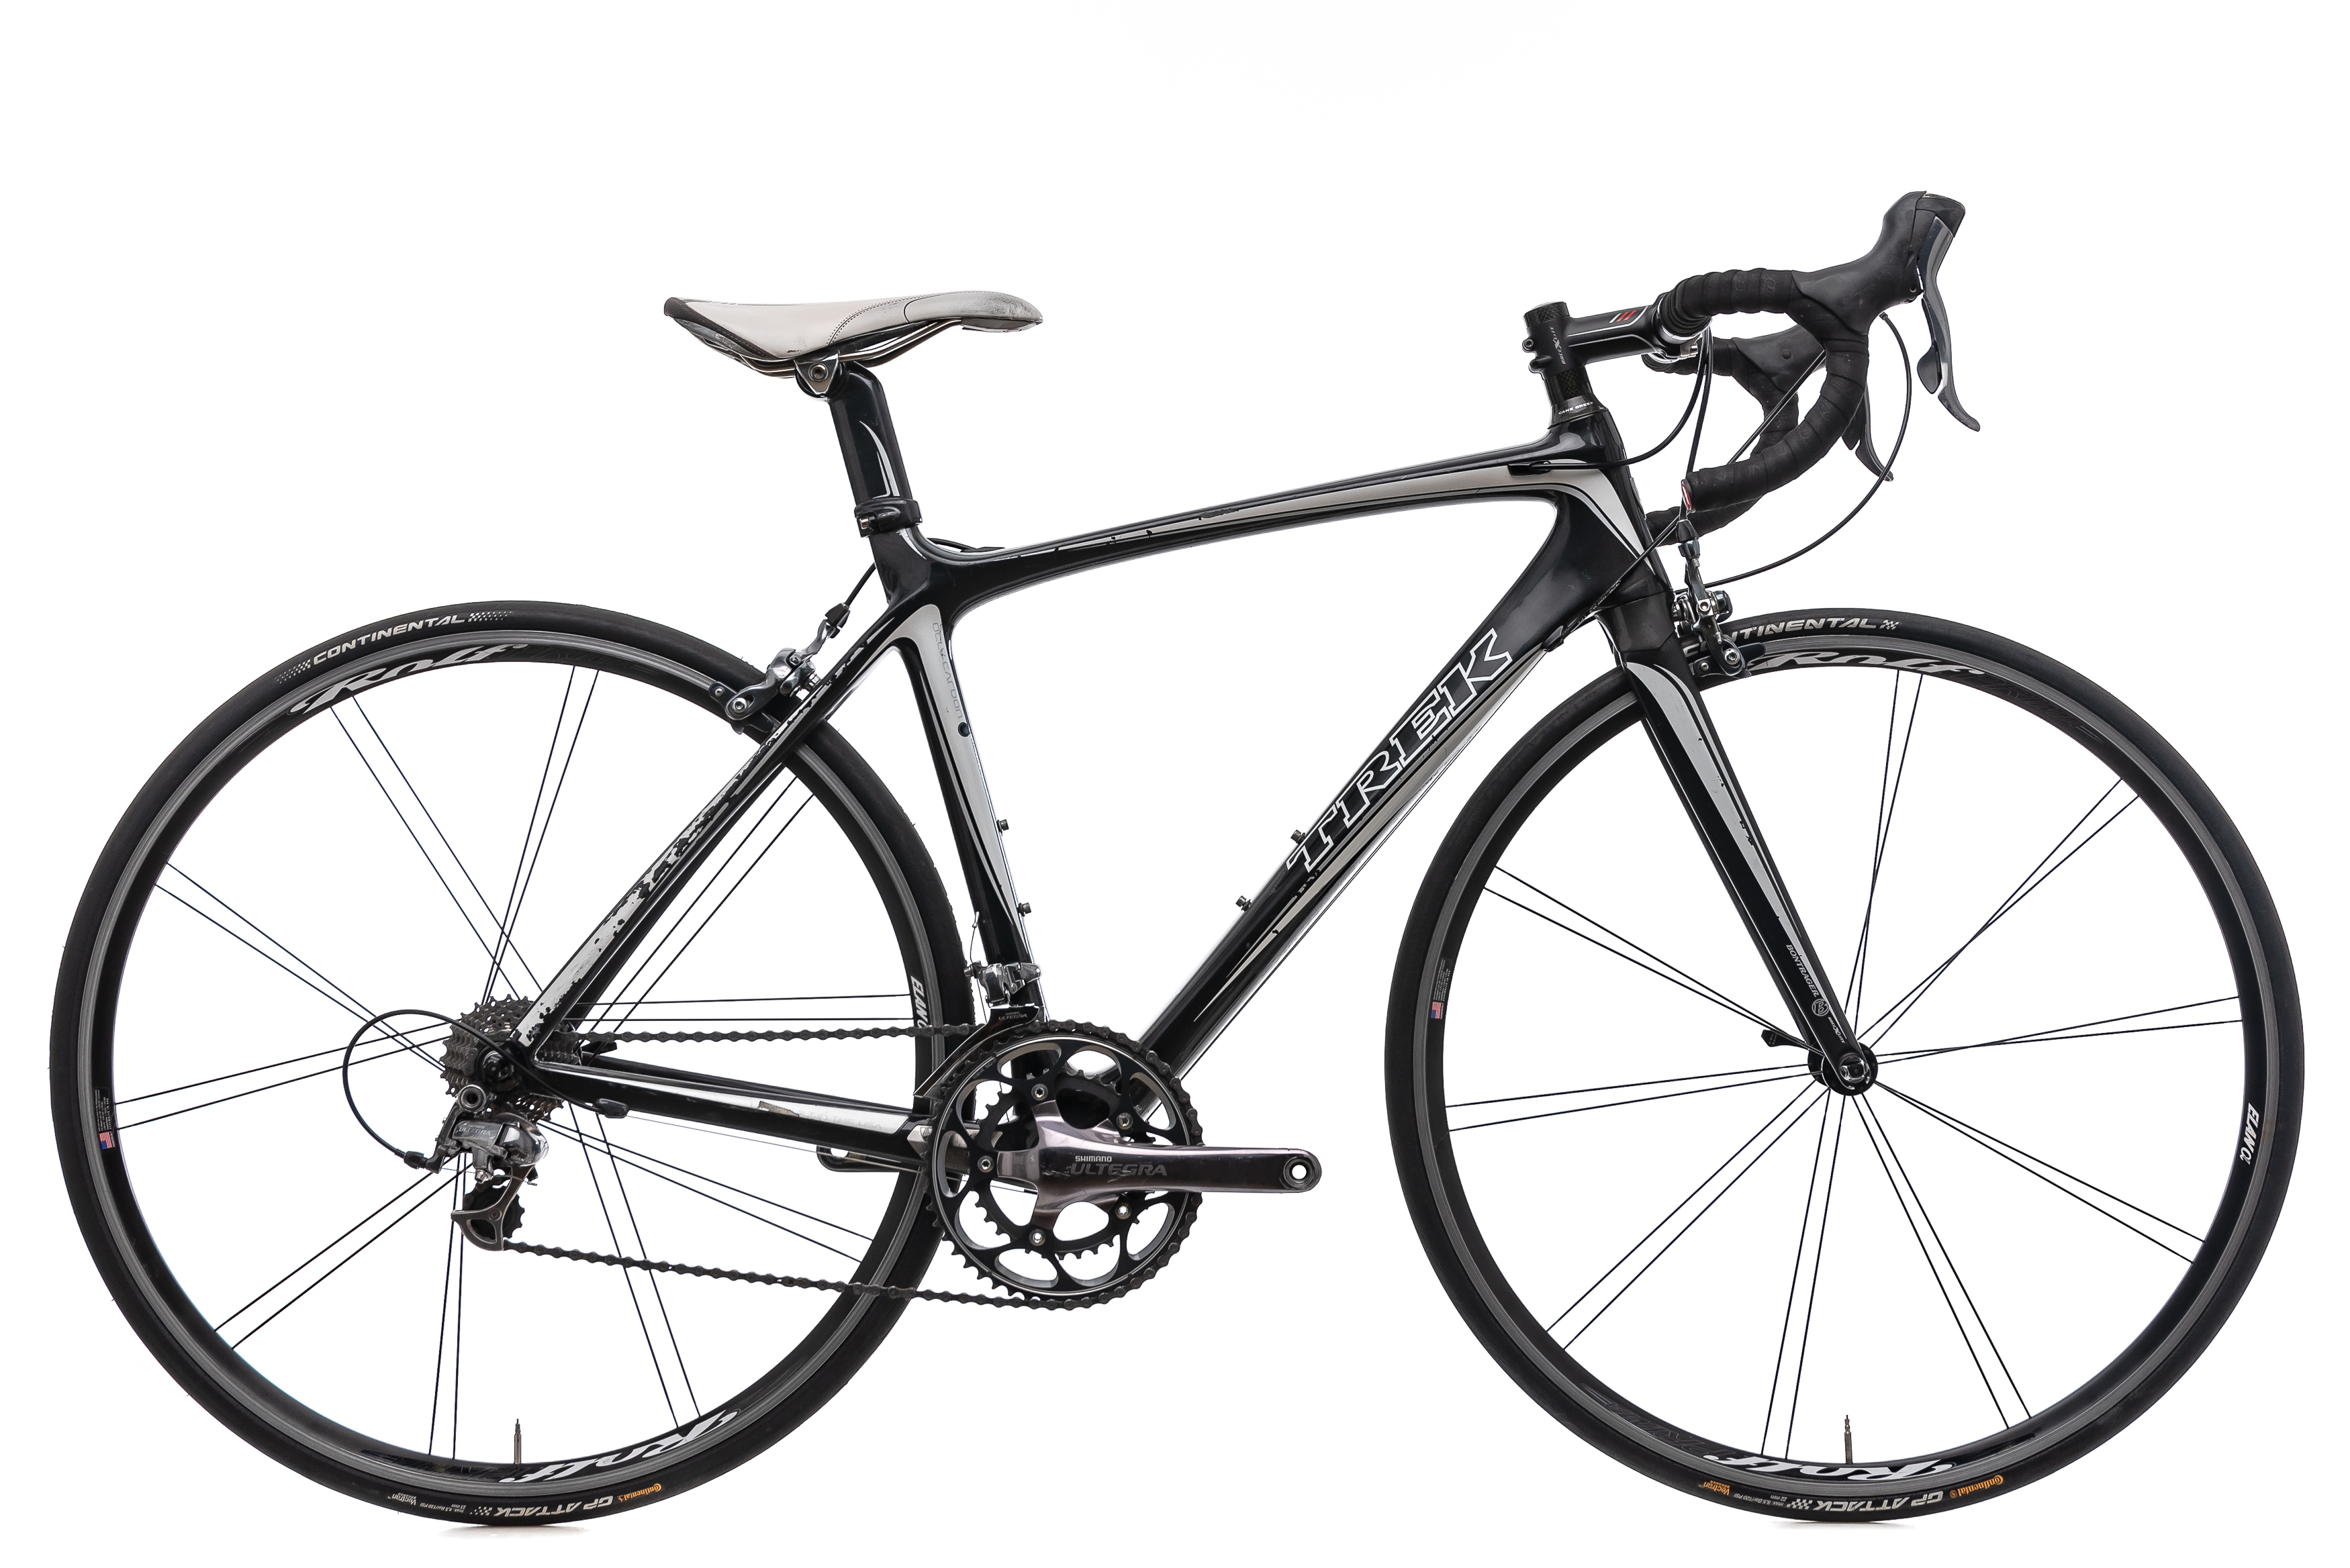 6907cae05b8 2008 Trek Madone 5.2 Road Bike 52cm Carbon Shimano Ultegra 10s Rolf Elan  Alpha